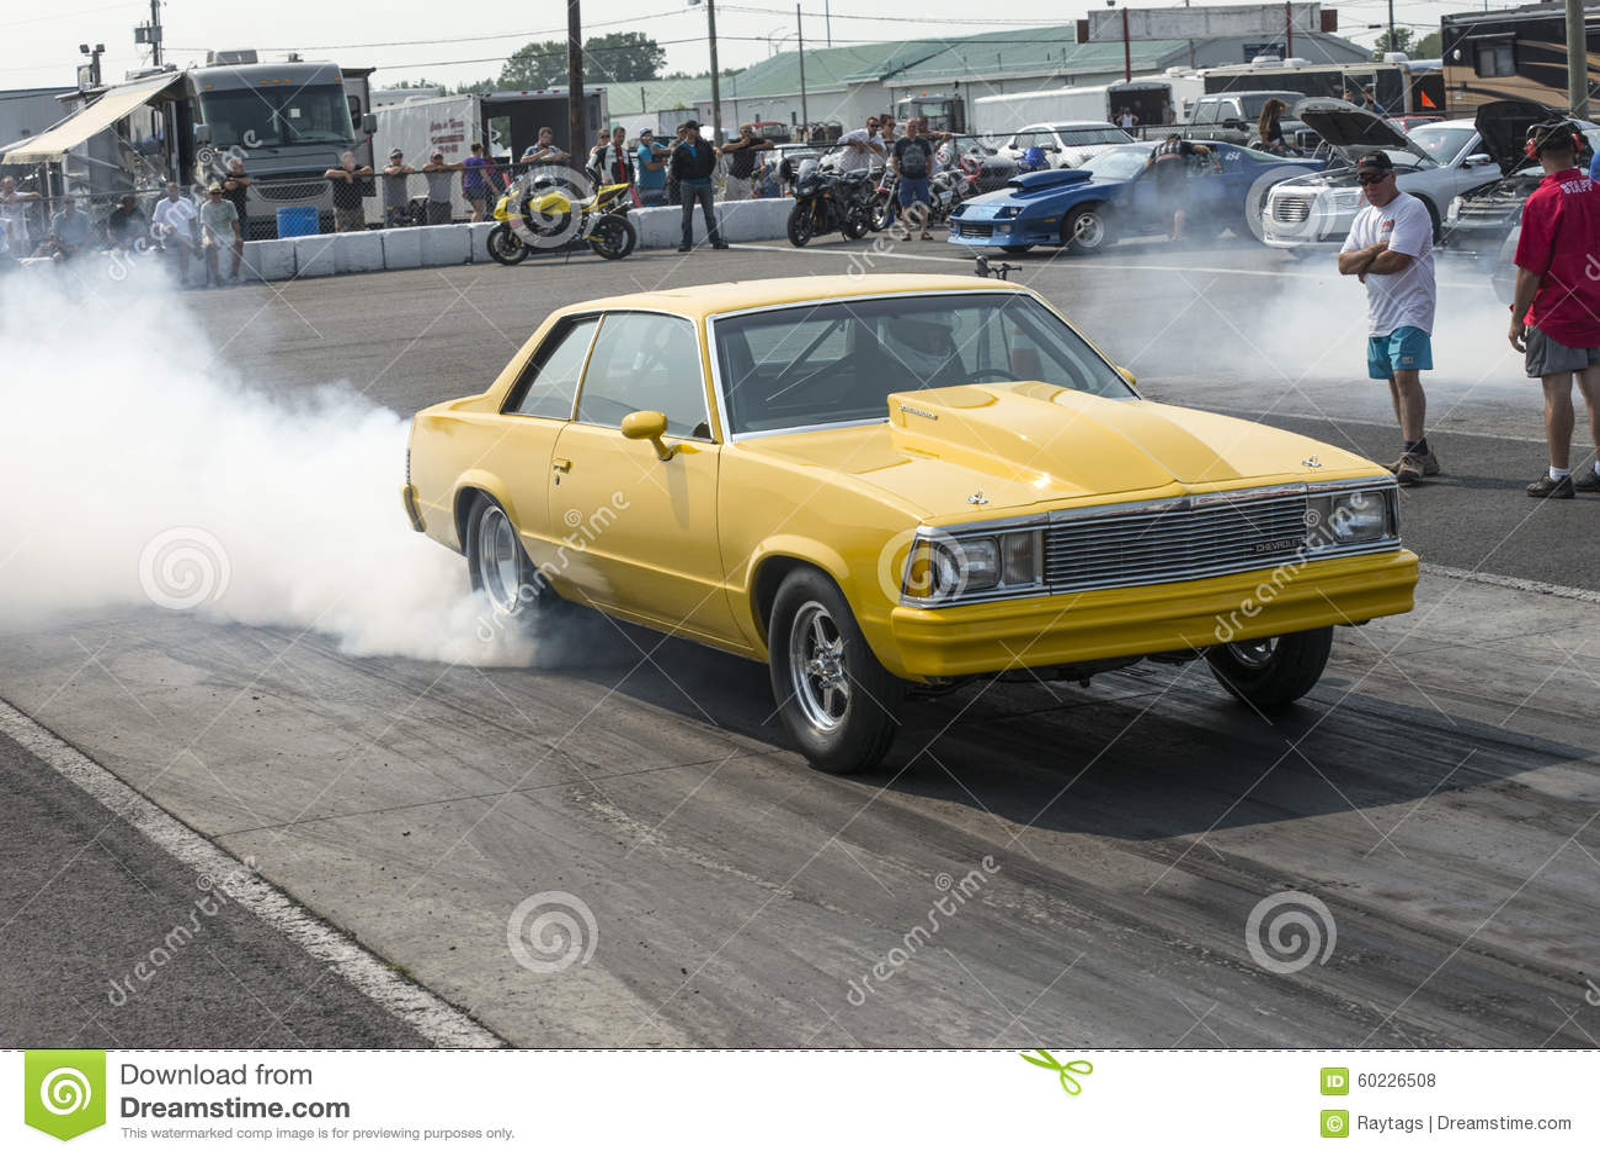 Drag racing editorial stock photo. Image of horsepower - 60226508